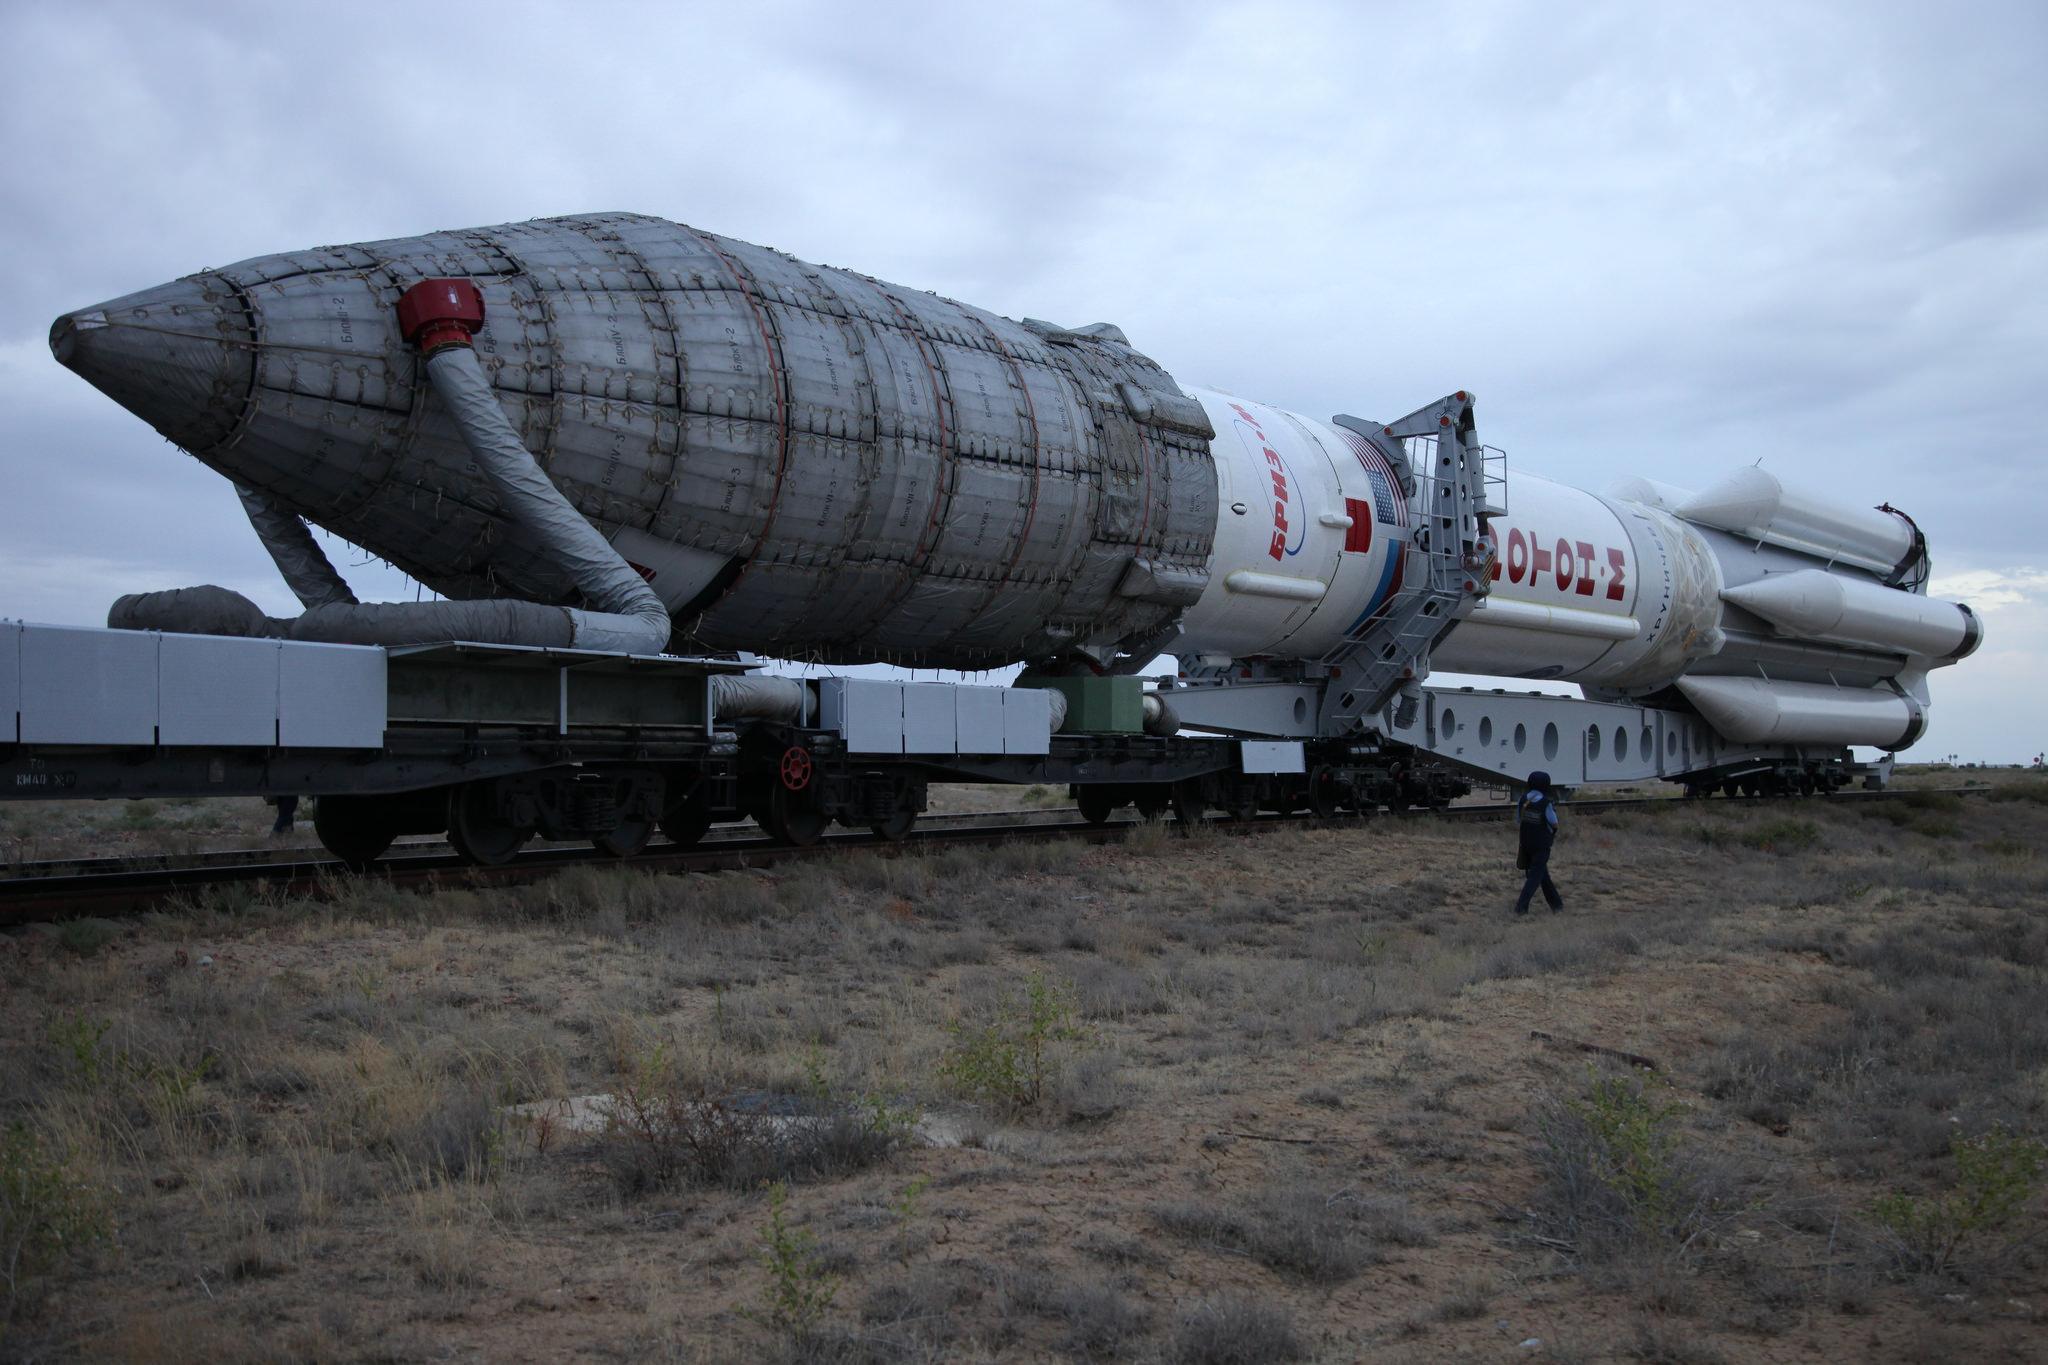 Ракетоноситель Протон-М на космодроме Байконур, Байконур